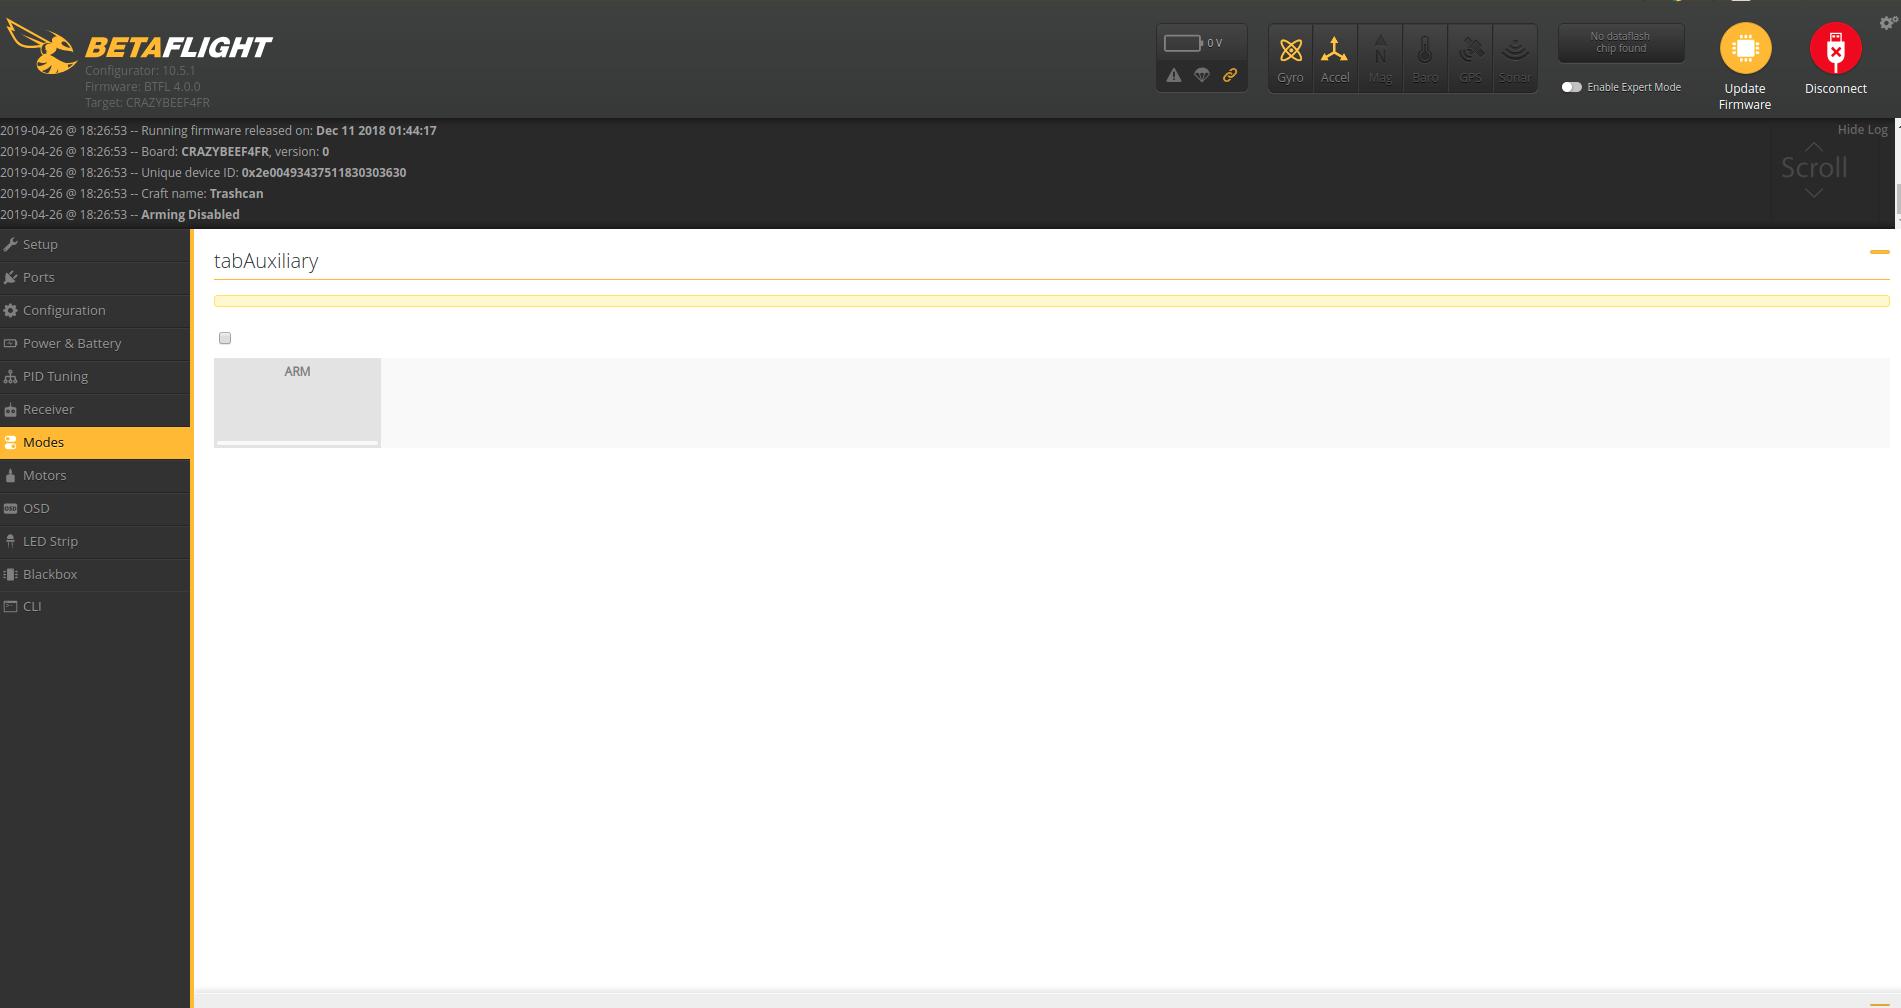 Mode page is broken · Issue #1405 · betaflight/betaflight